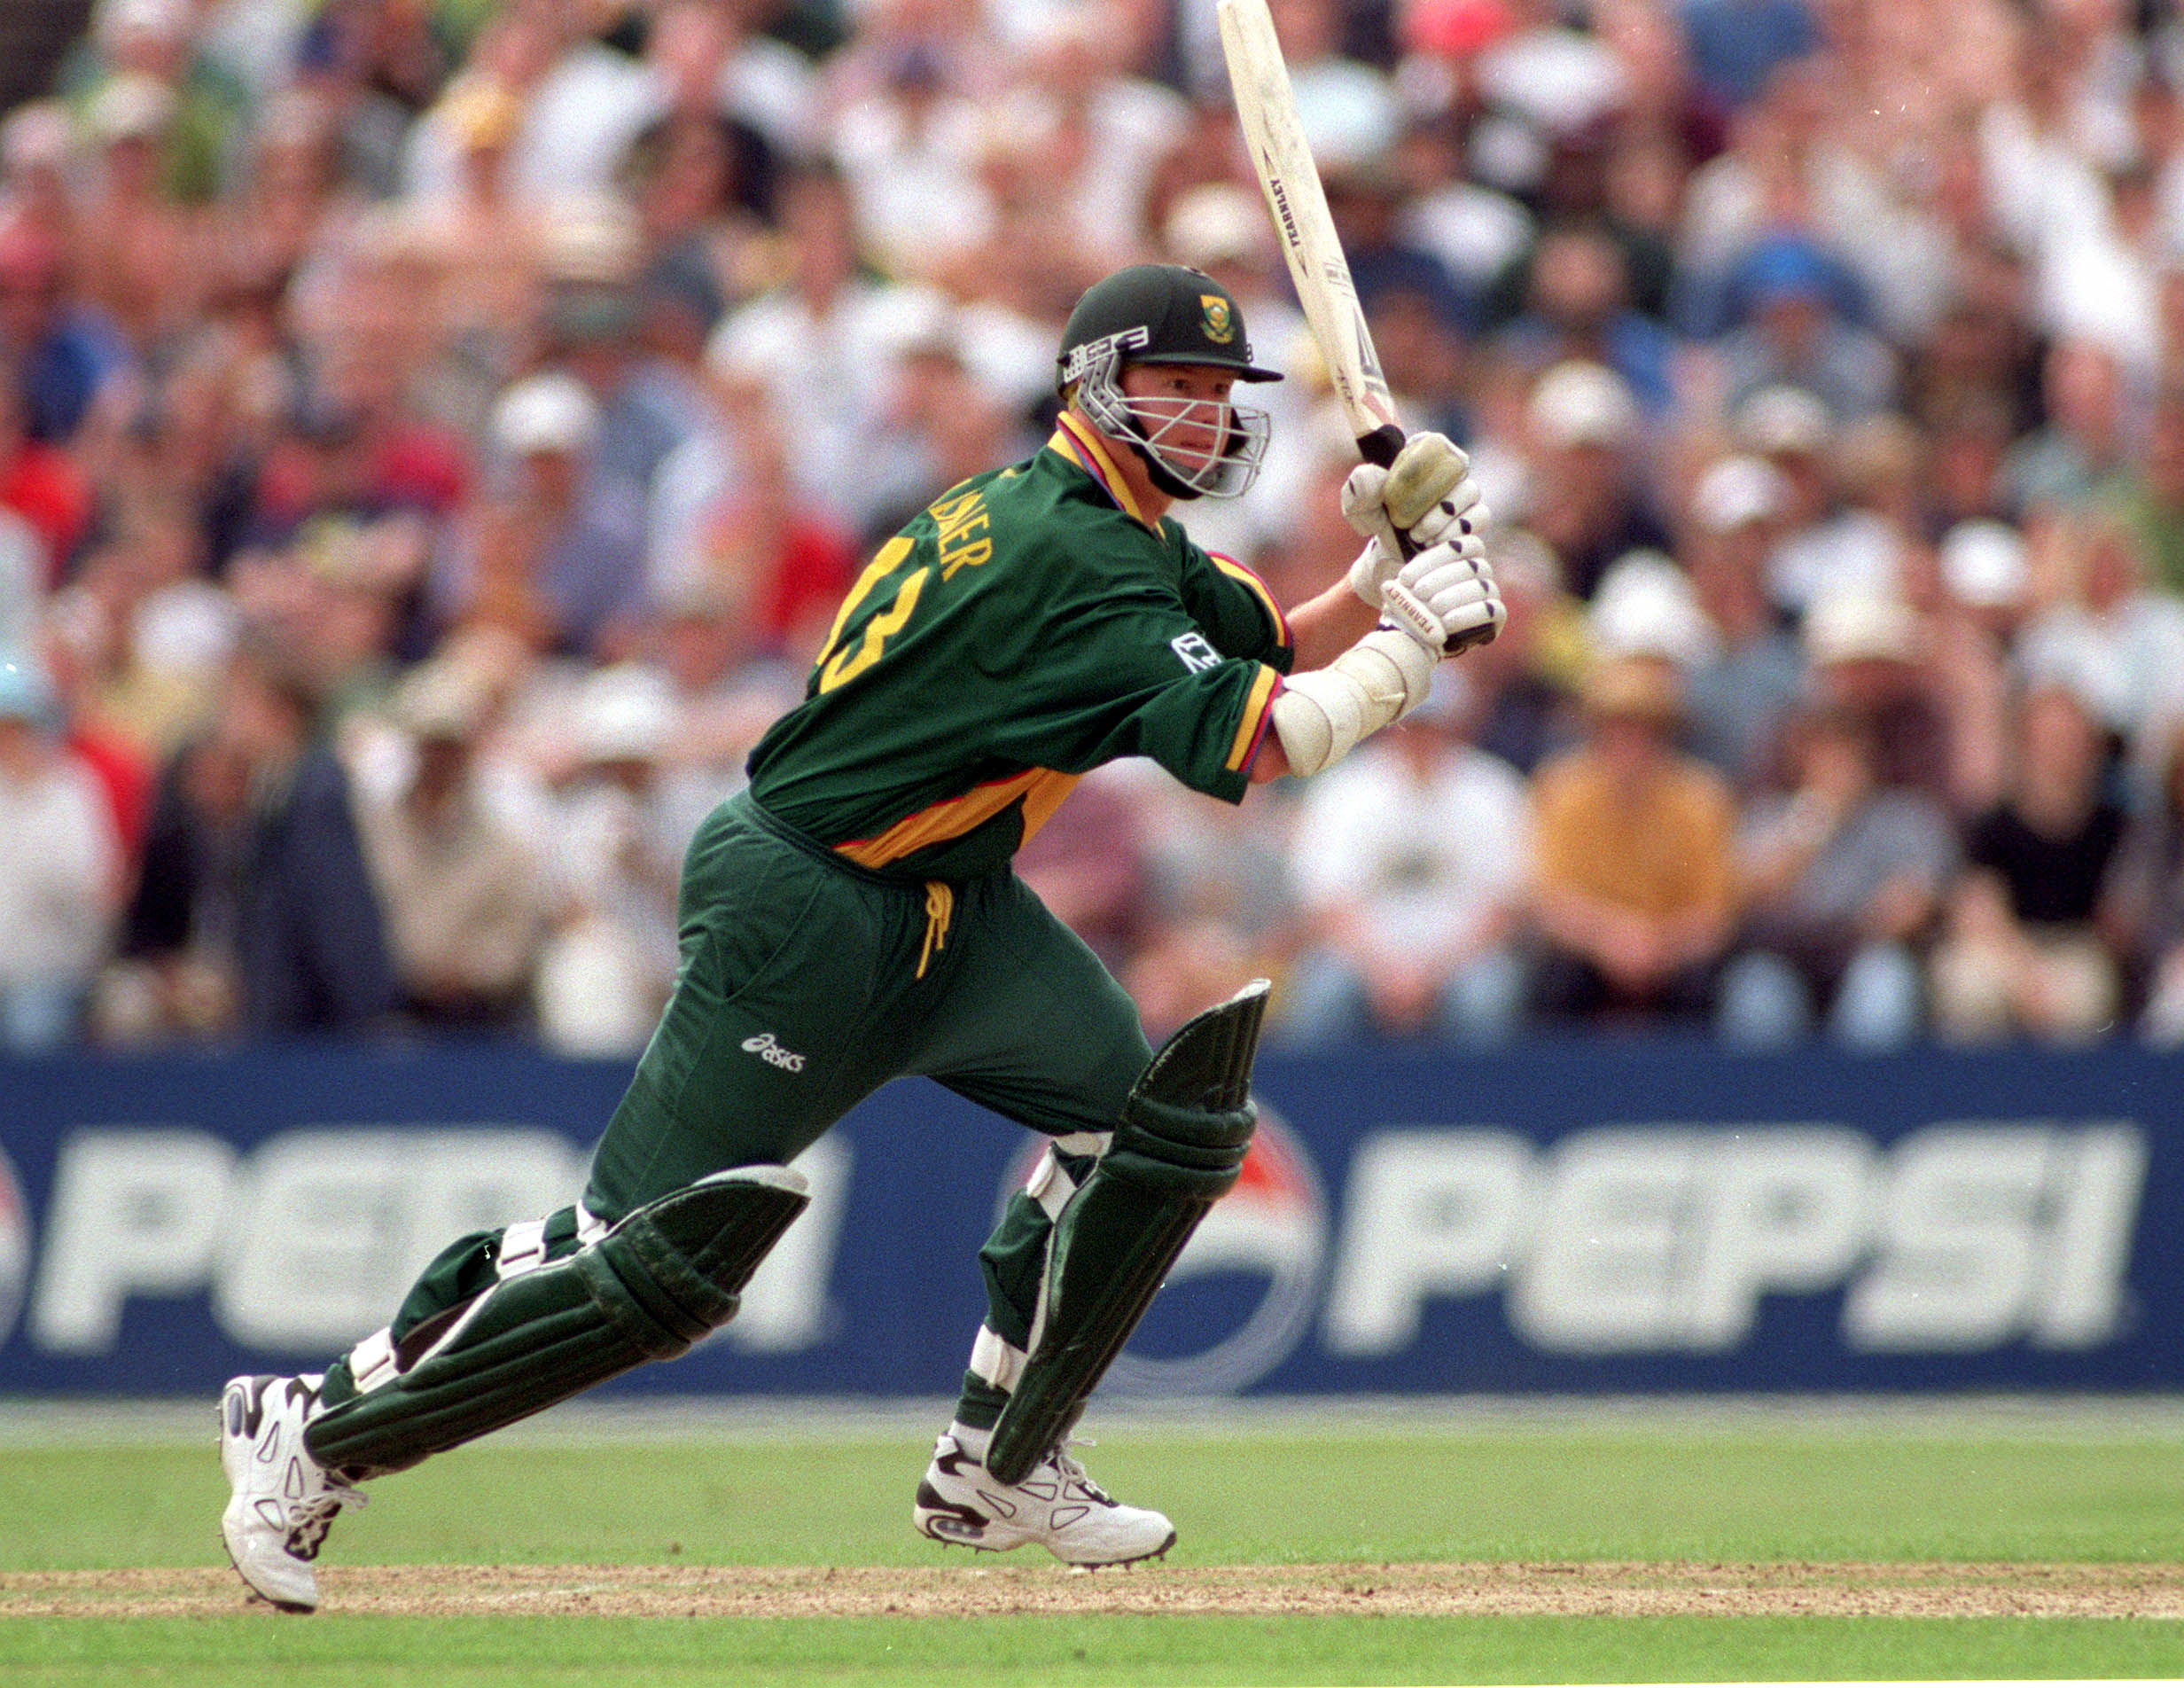 Lance Klusener for South Africa Cricket Team